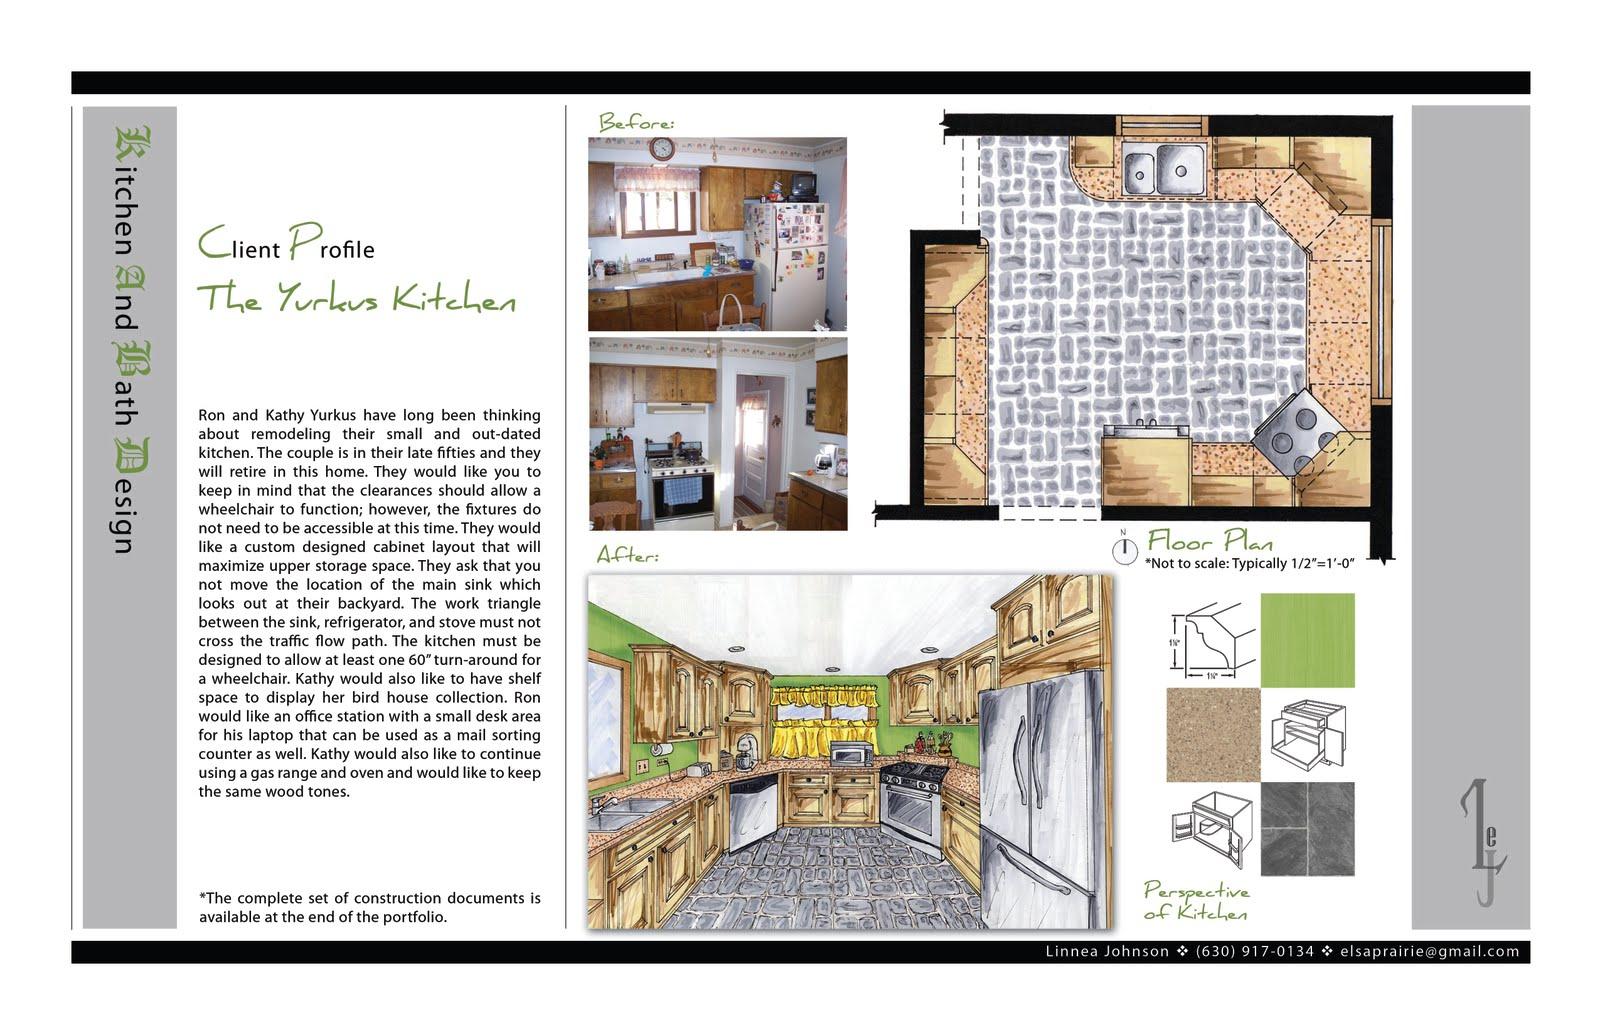 Linneajohnson-portfolio.blogspot.com